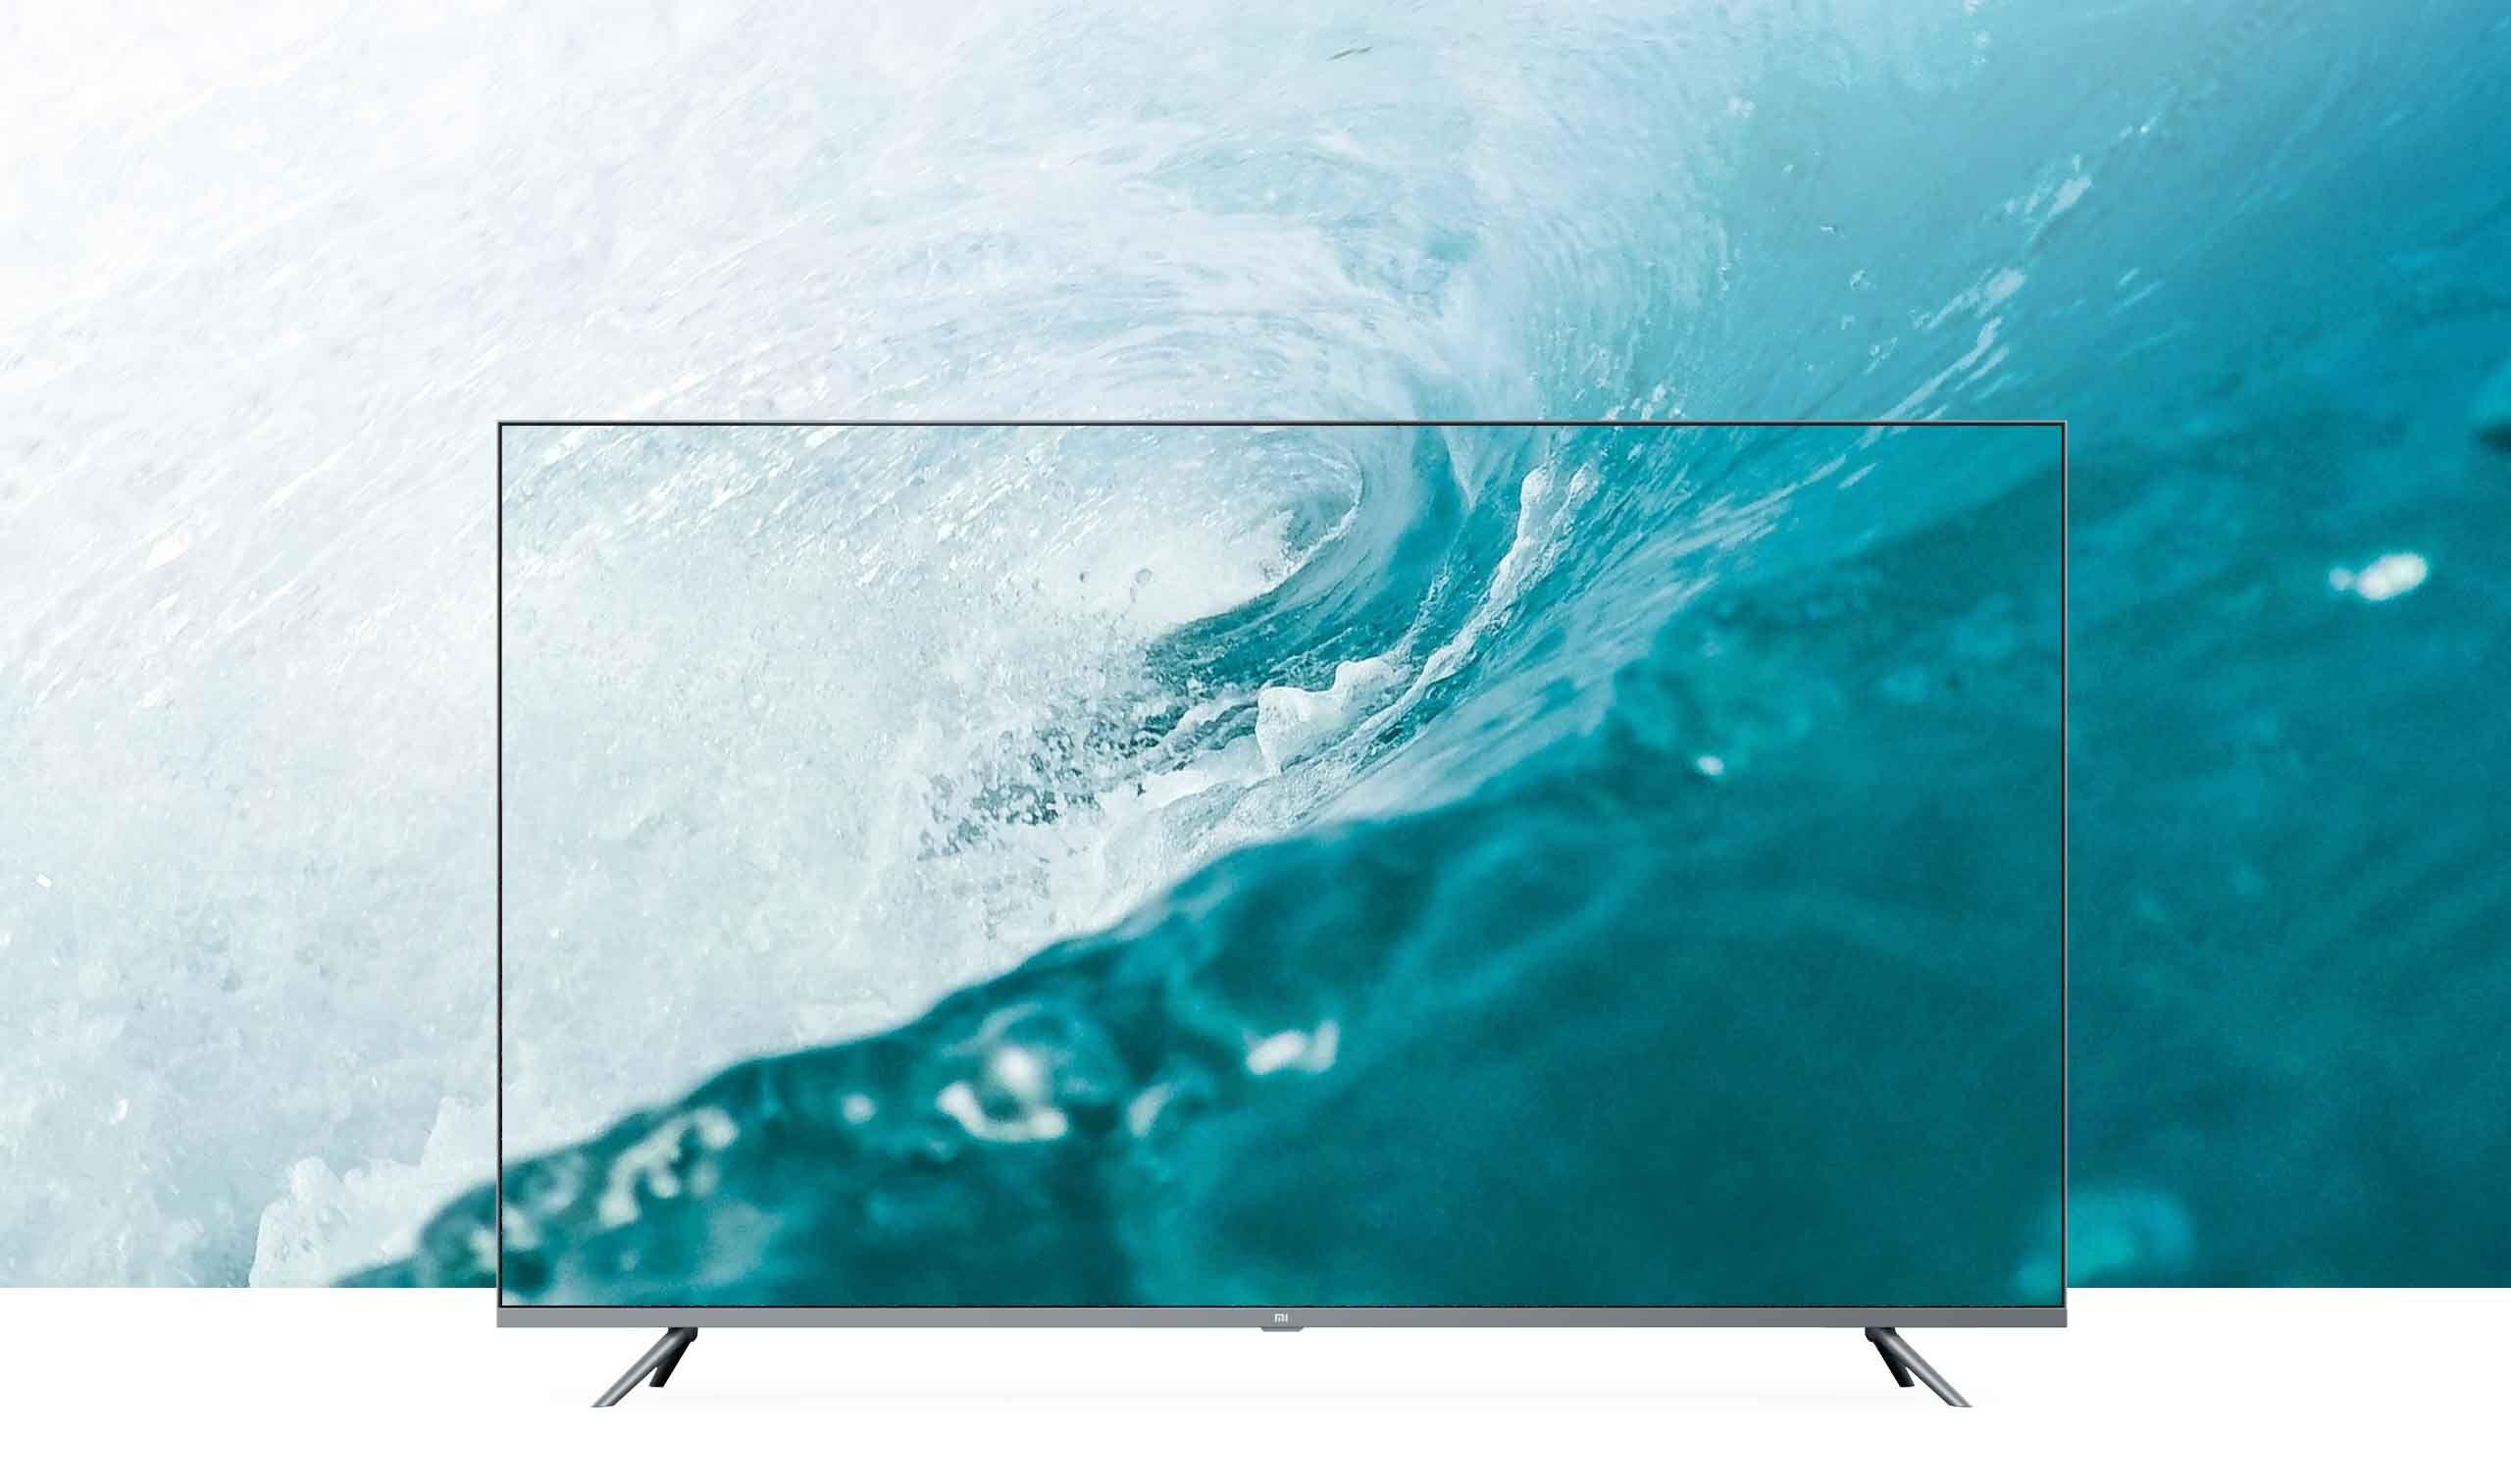 Dolby + DTS Mi TV All Pro E55S